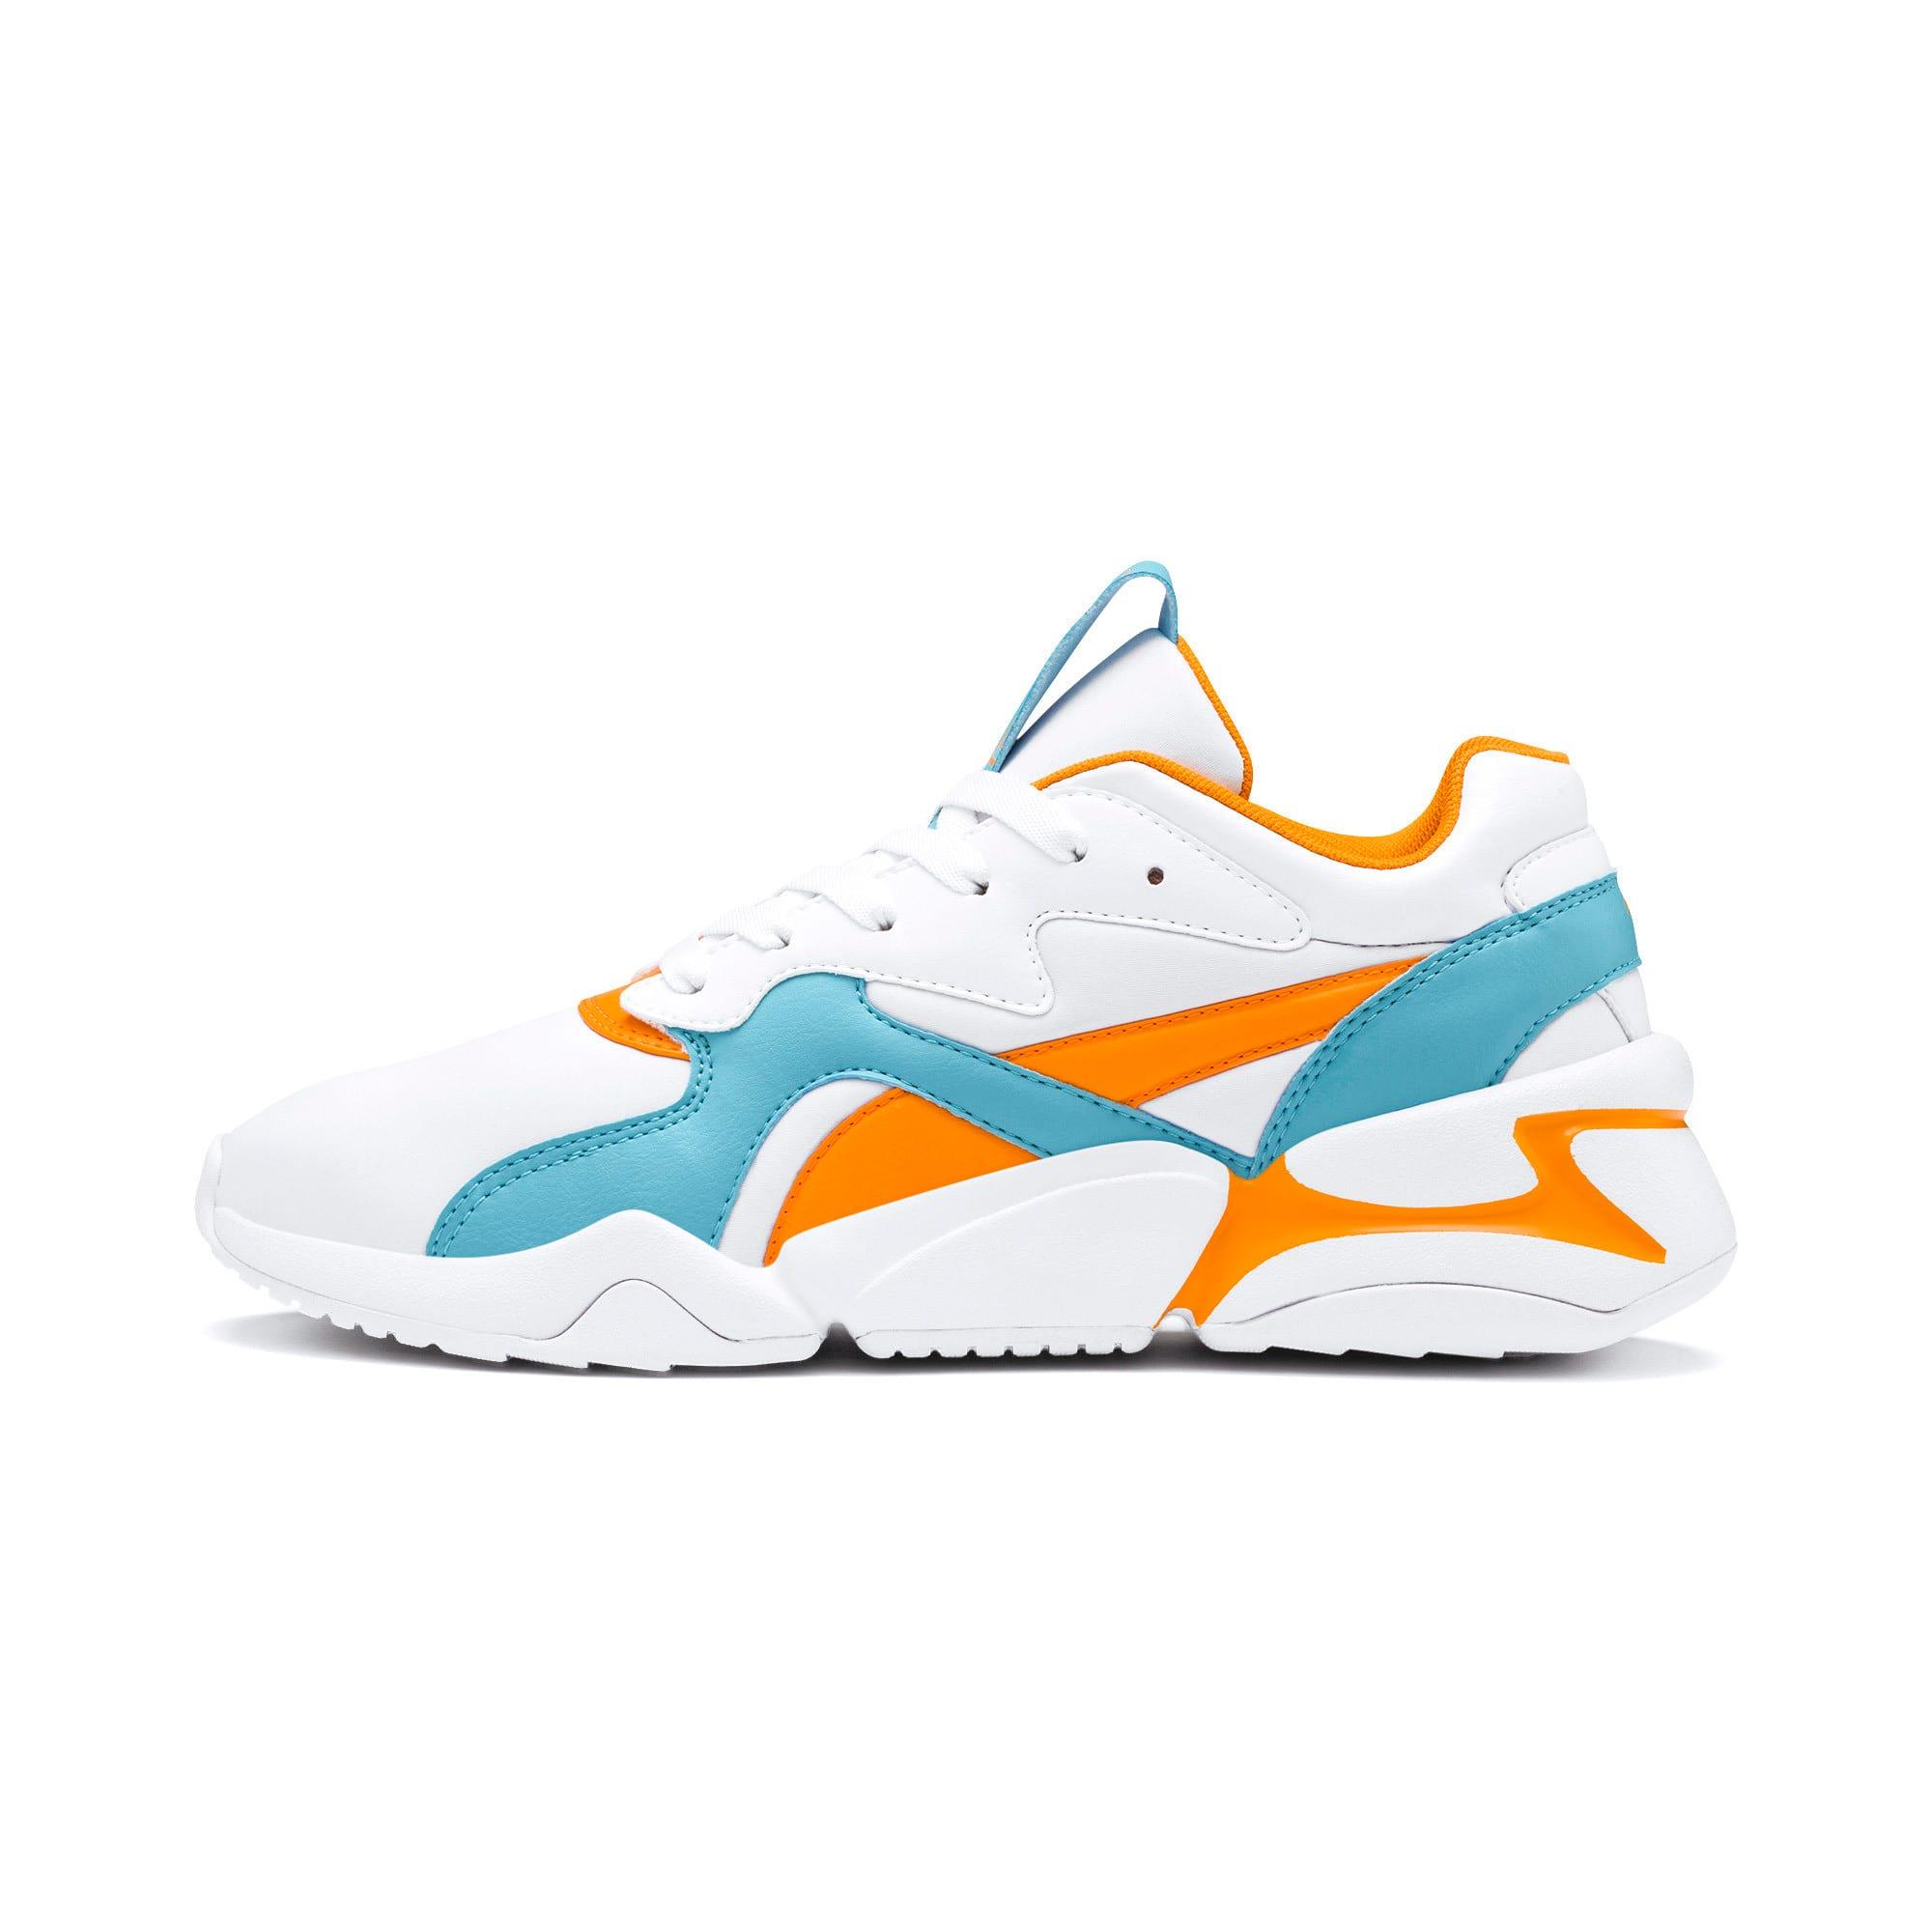 Thumbnail 1 of Nova Women's Sneakers, Puma White-Milky Blue, medium